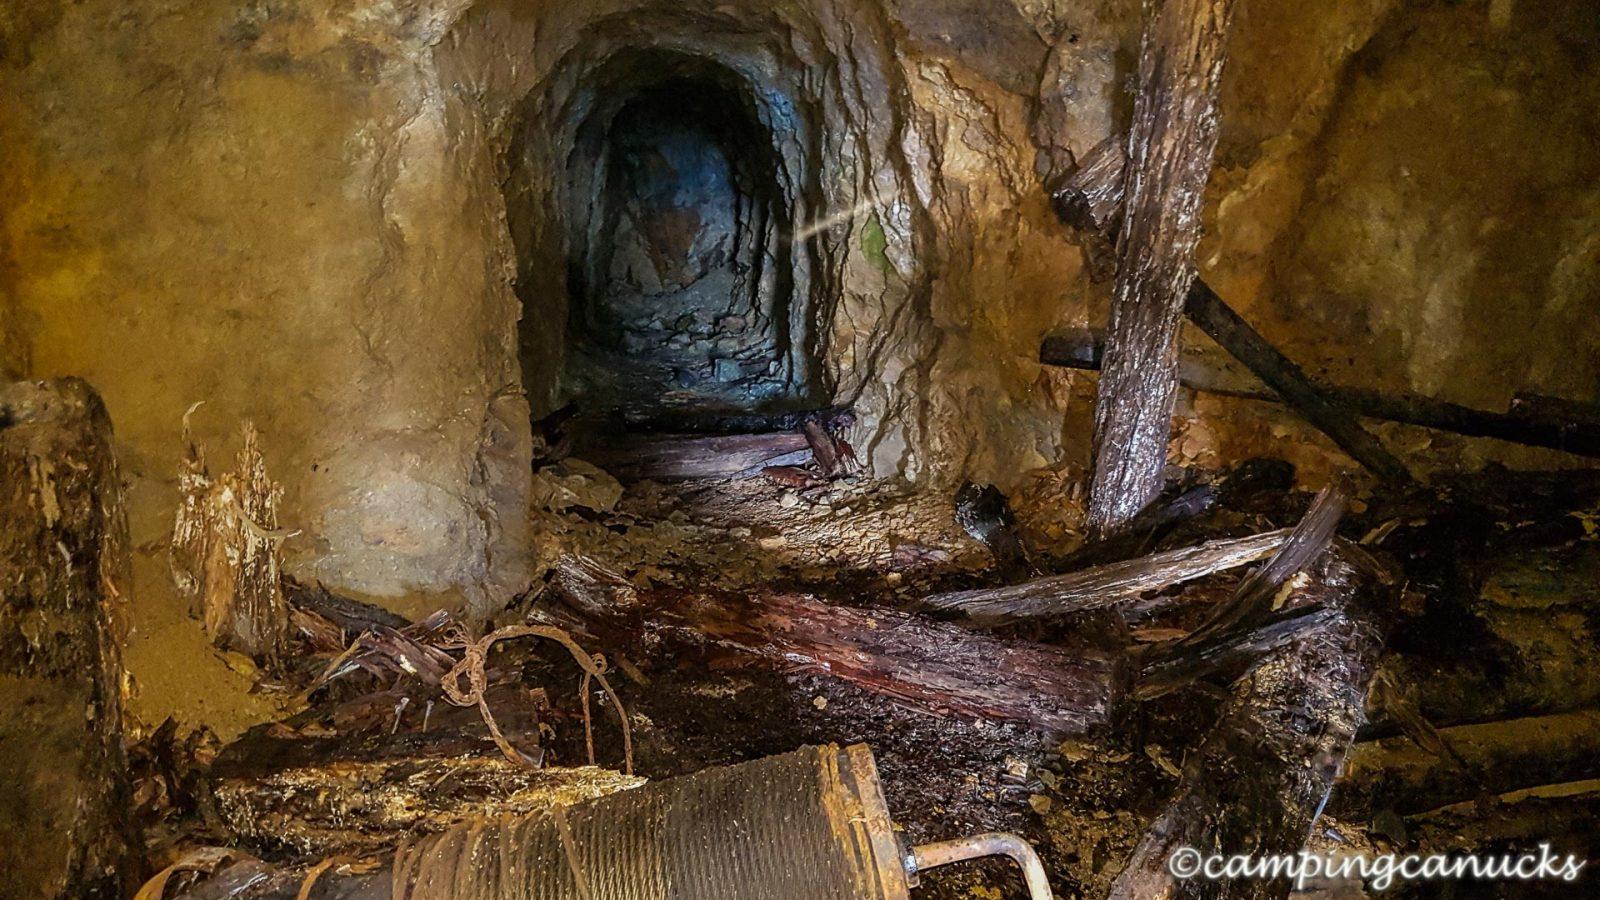 Peaking inside the old mine